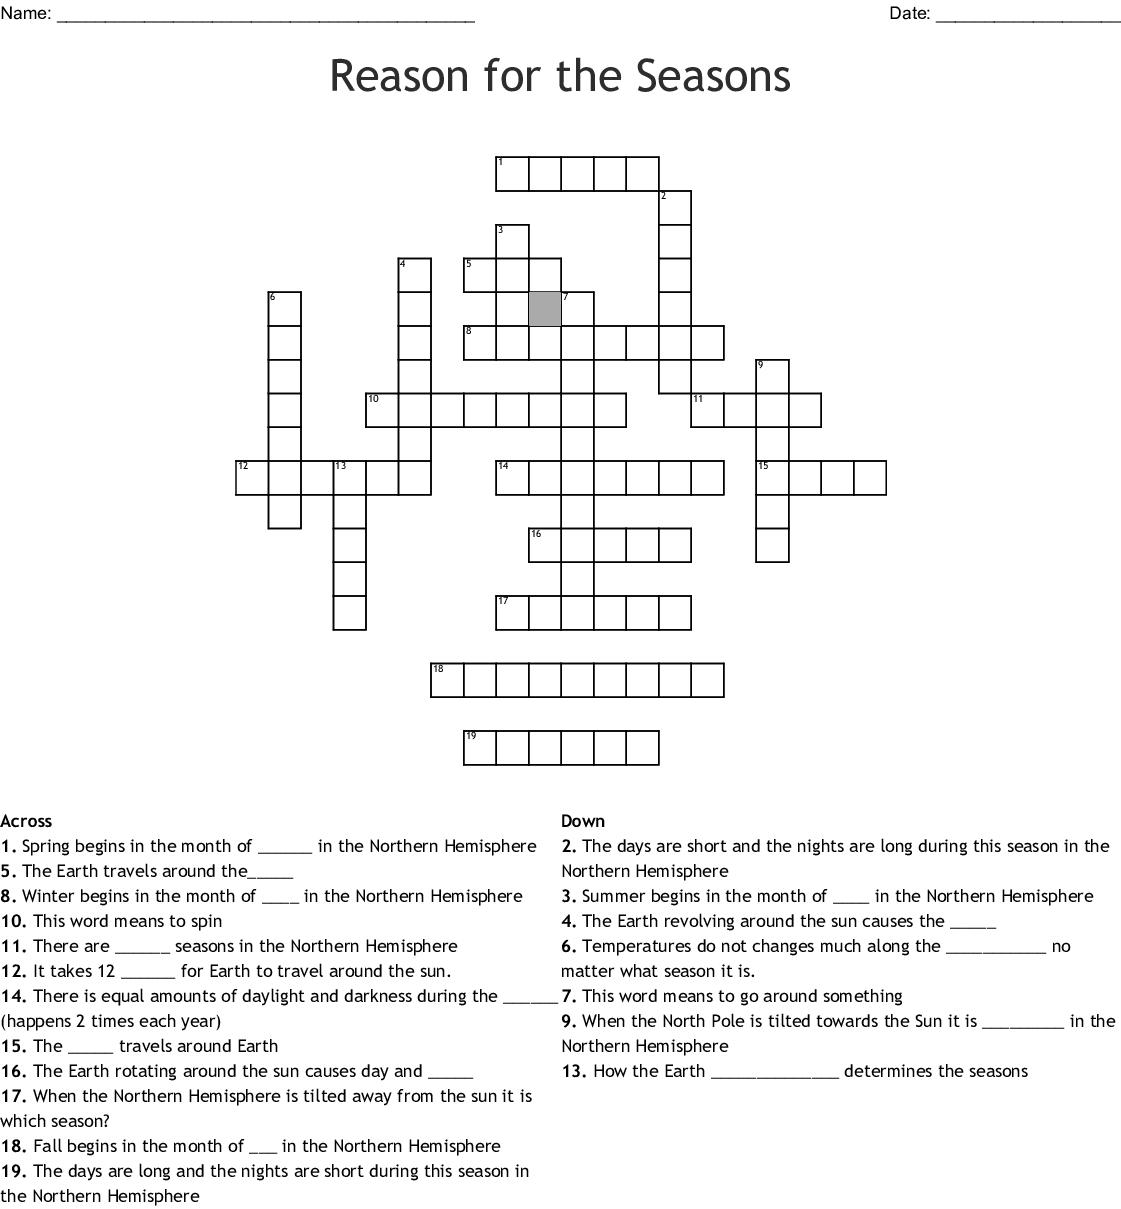 Reason For Season Word Search